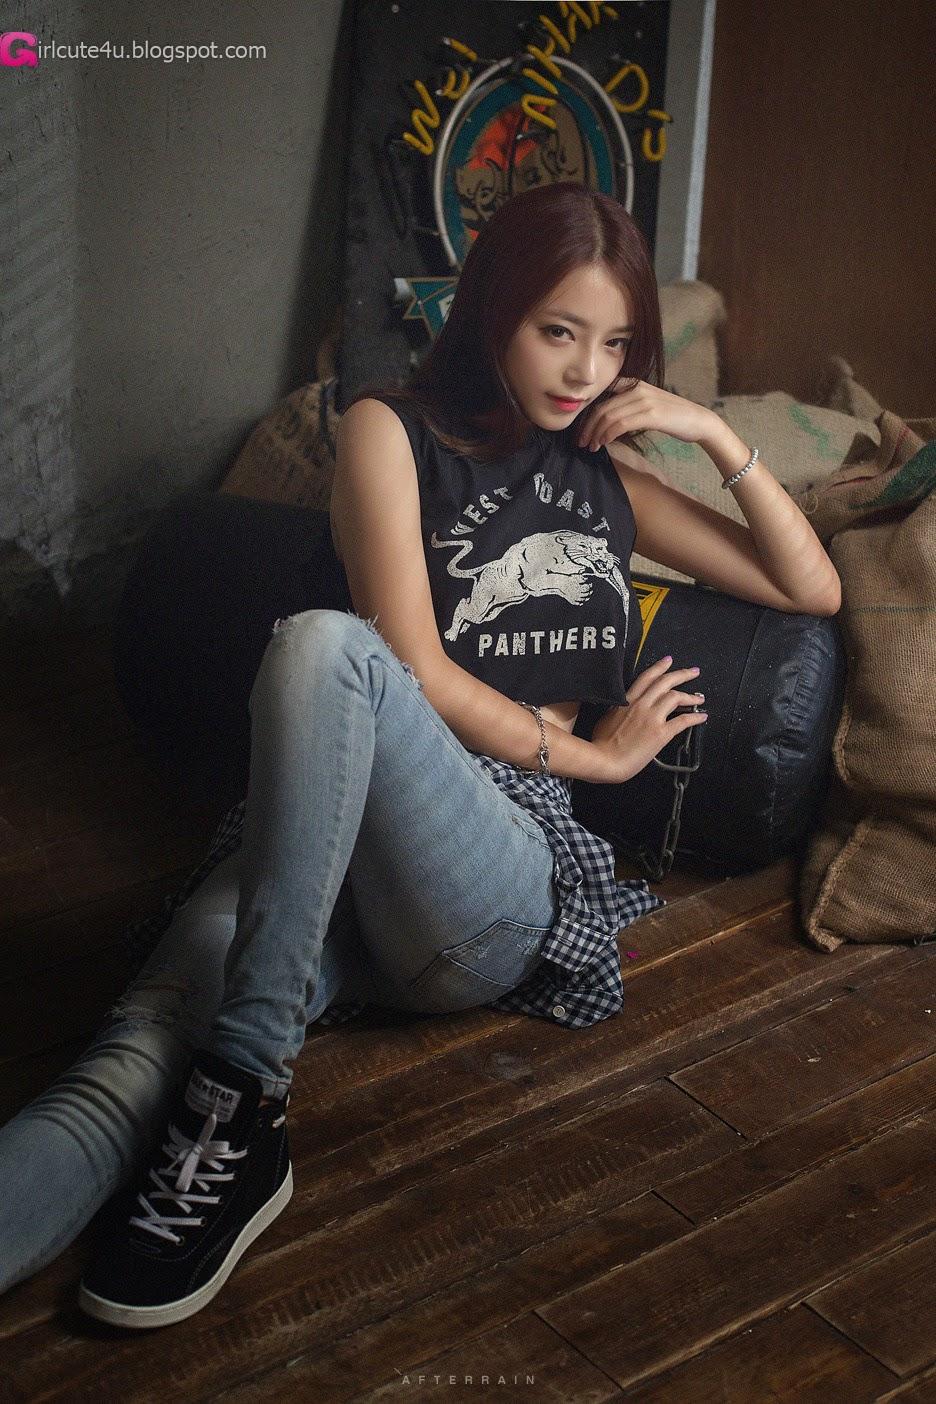 4 The wonderful Ji Yeon in 3 new sets - very cute asian girl - girlcute4u.blogspot.com